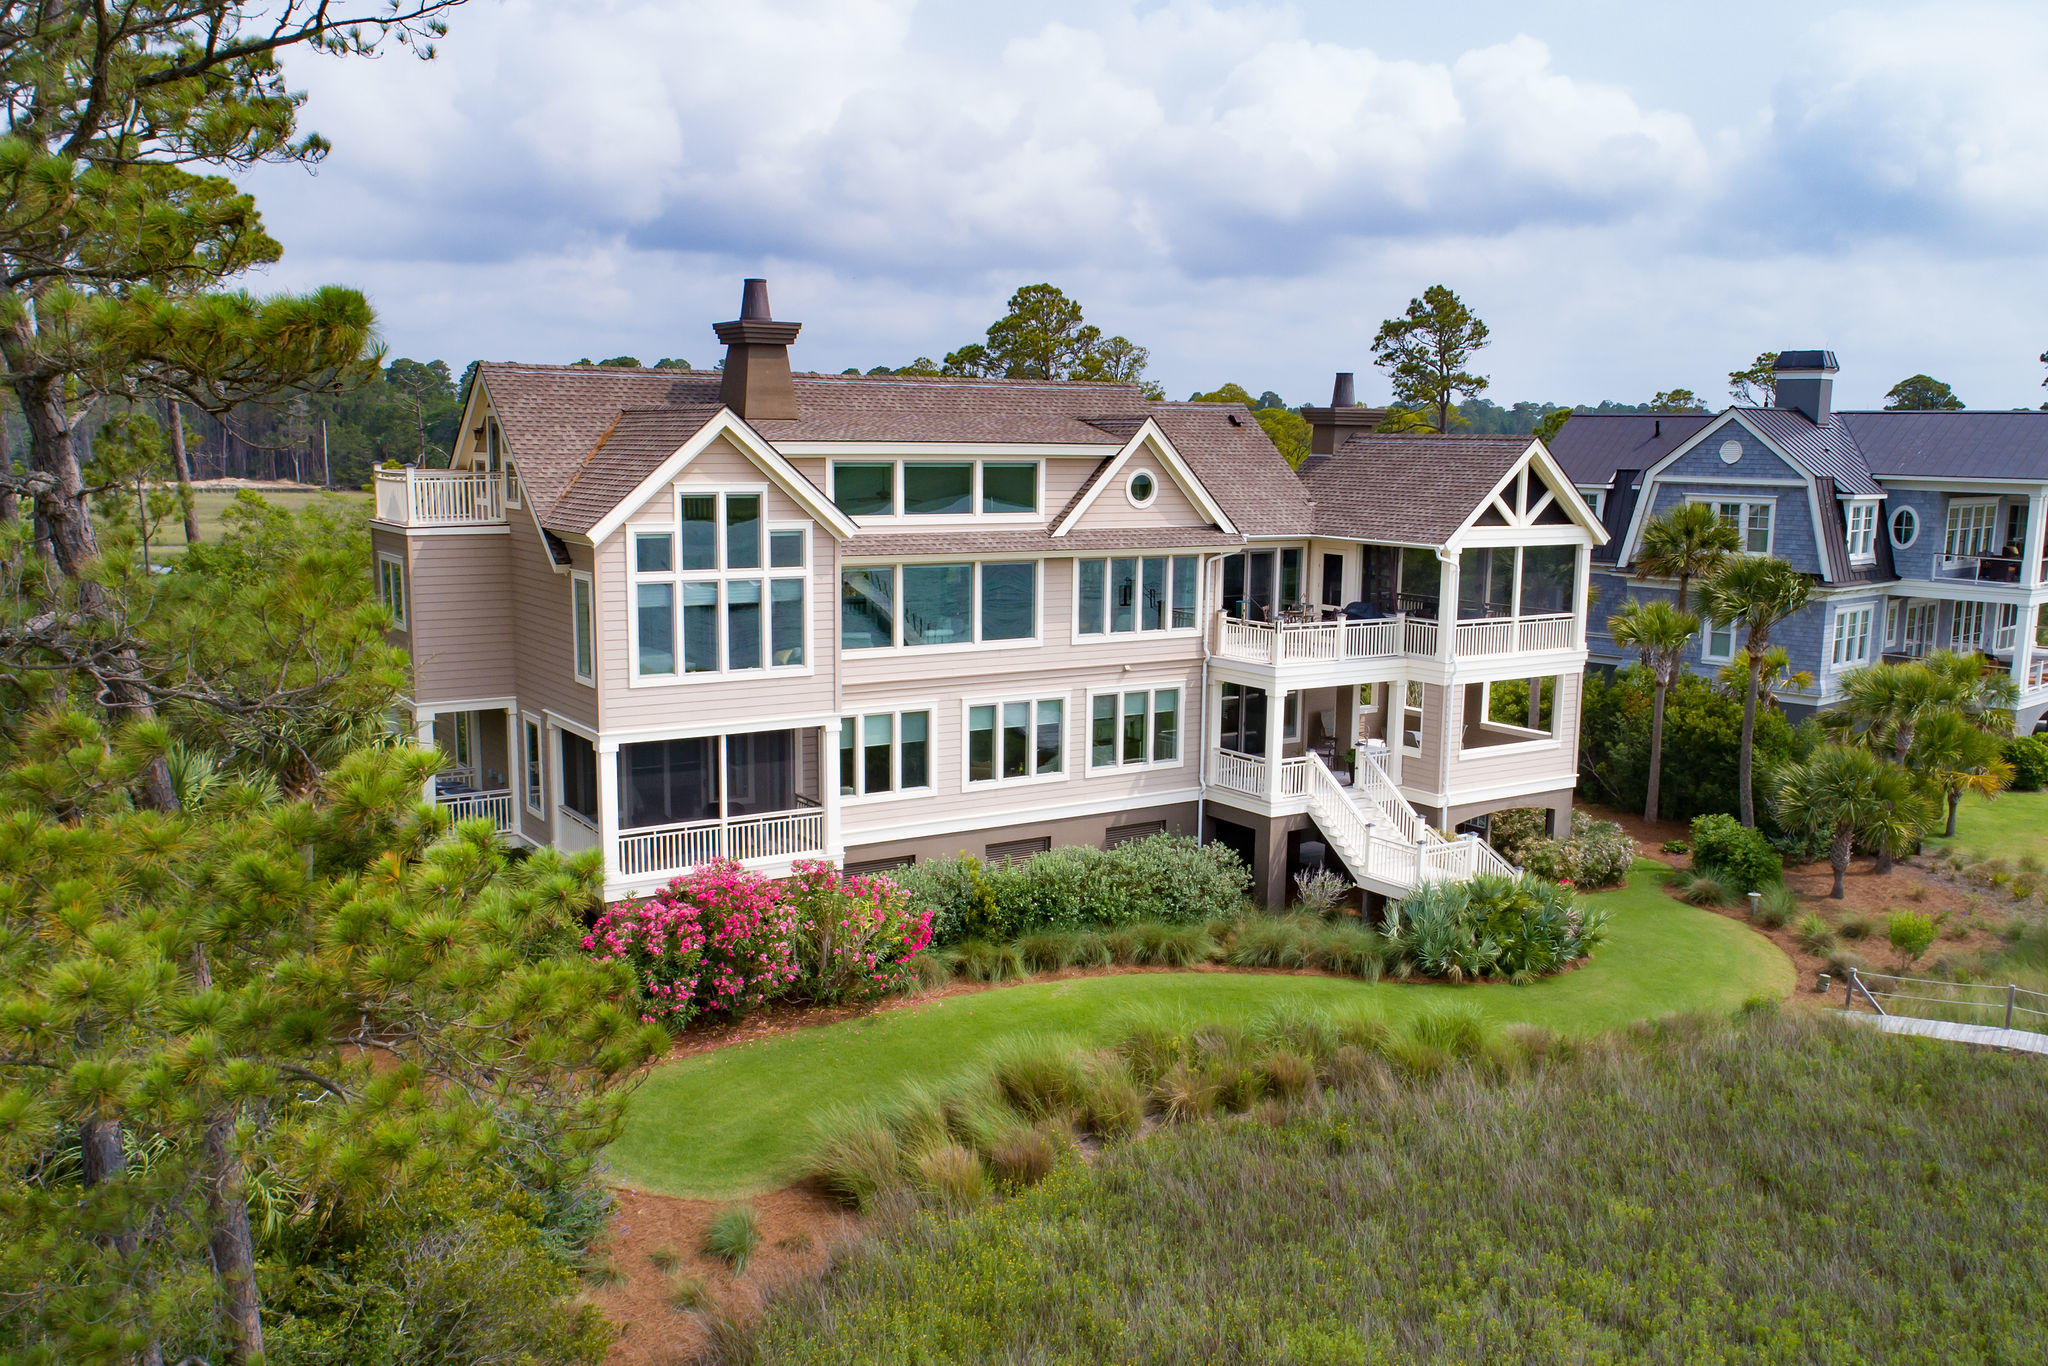 Seabrook Island Homes For Sale - 3135 Marshgate, Seabrook Island, SC - 12